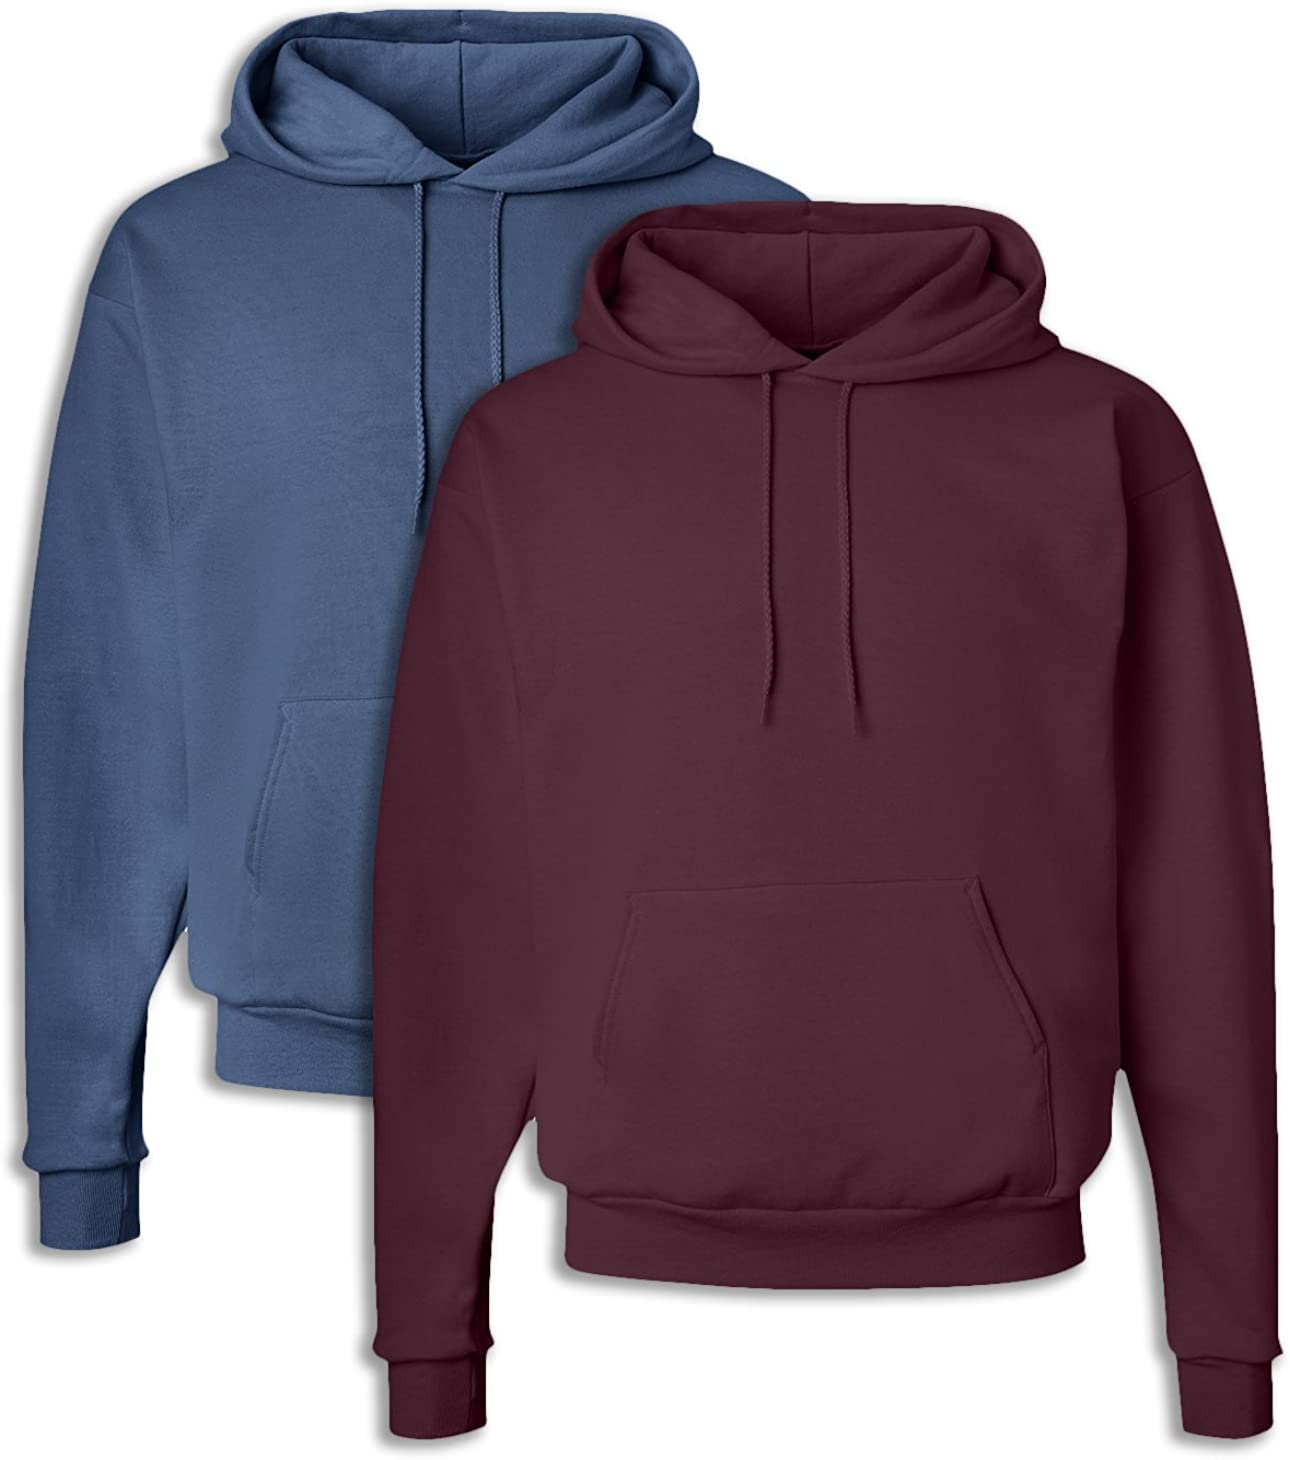 1 Maroon Hanes P170 Mens EcoSmart Hooded Sweatshirt 3XL 1 Denim Blue